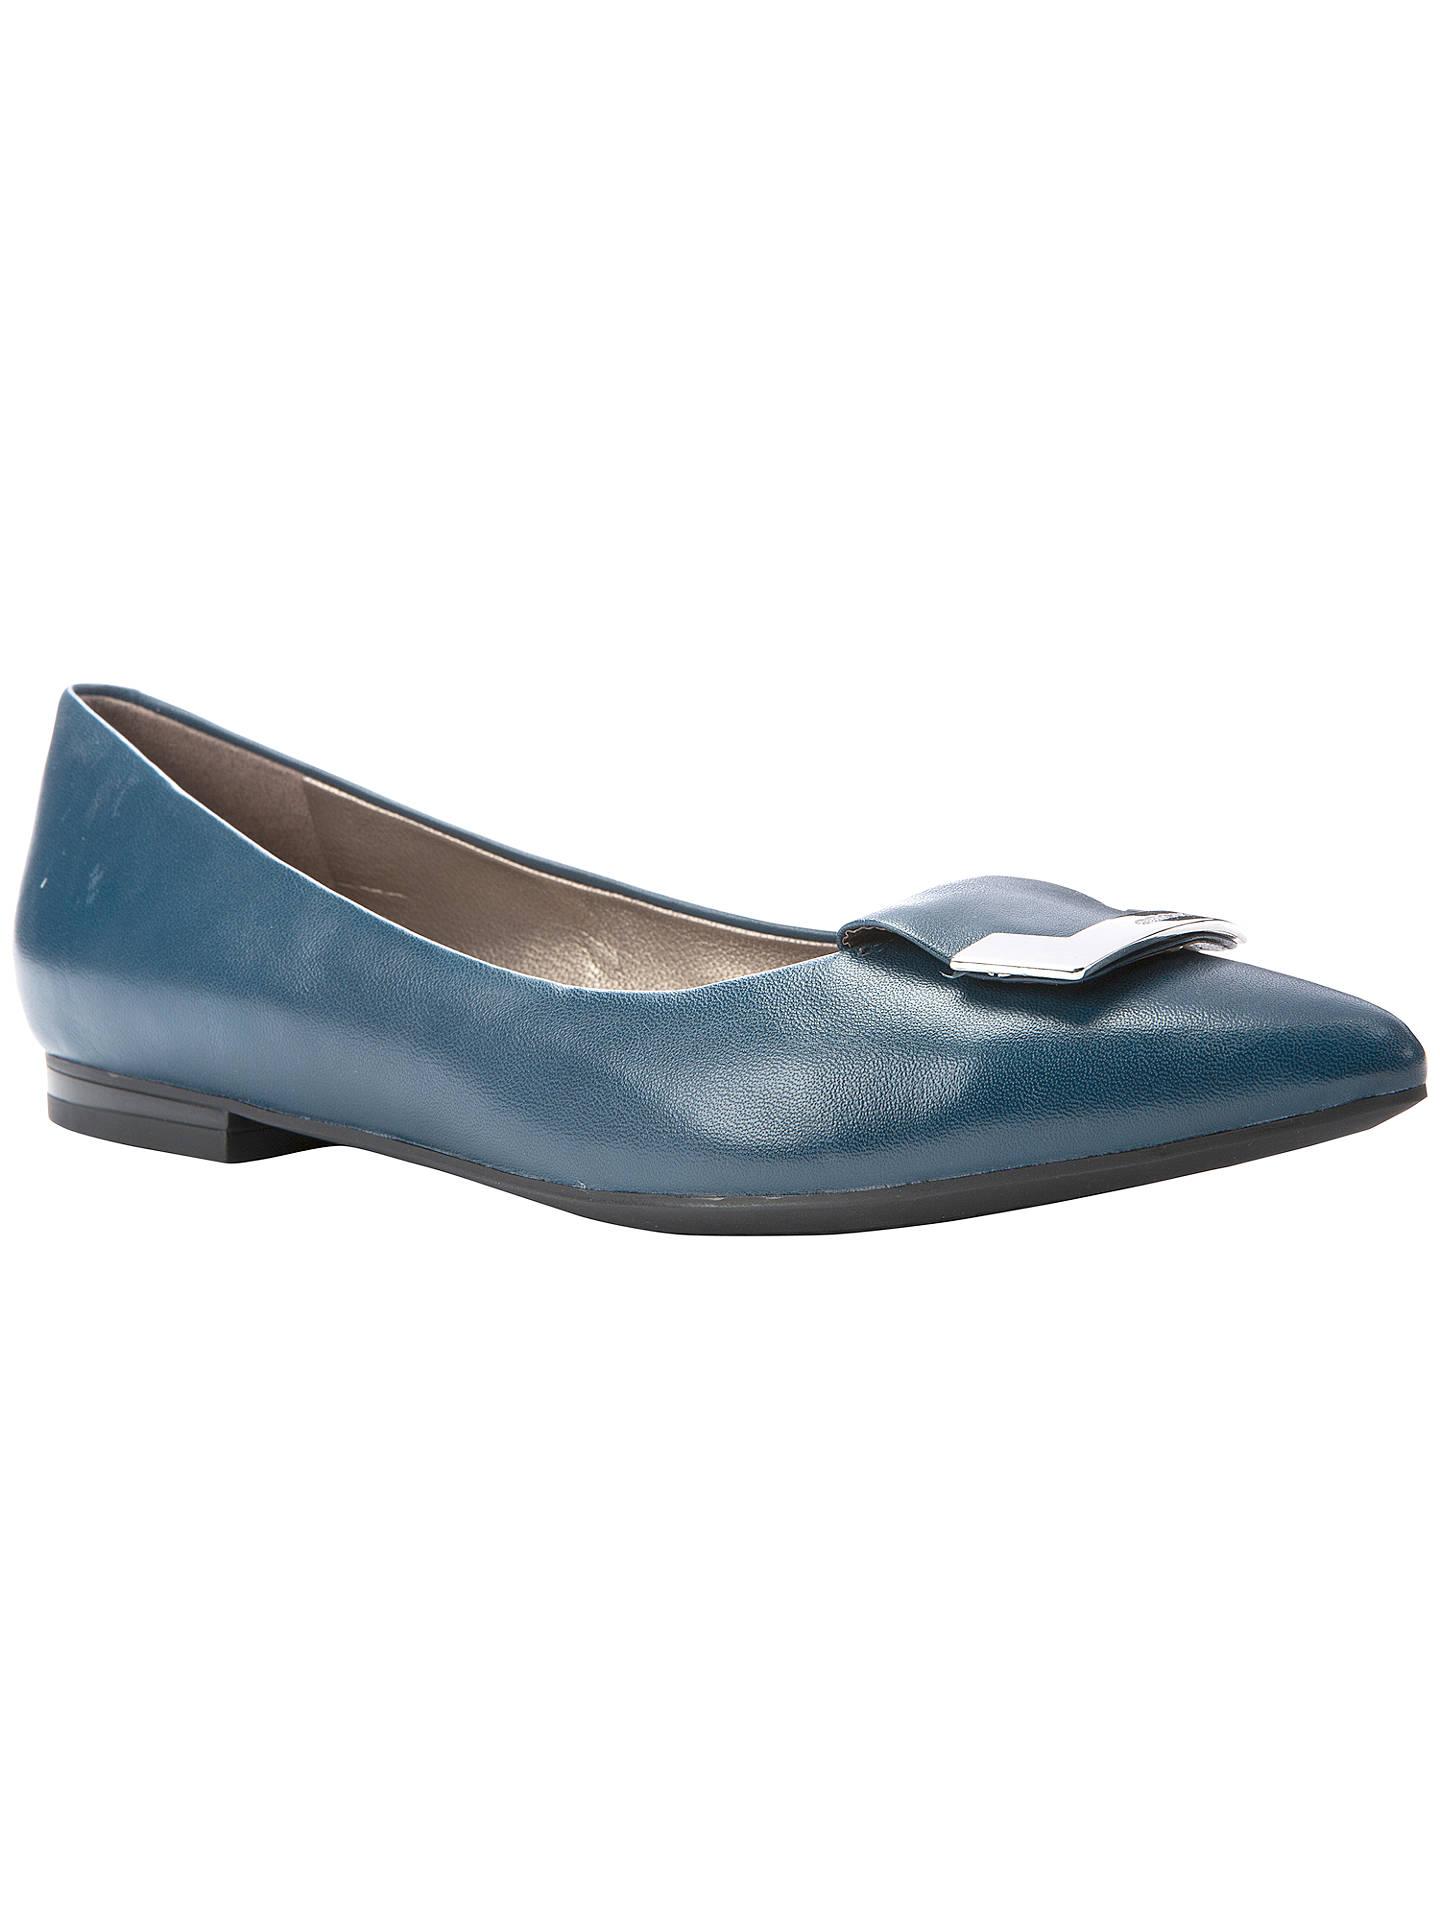 bd9d5c194c7b7 Buy Geox Rhosyn Flat Low Heeled Toe Pointed Pumps, Ocean Blue Leather, 5  Online ...